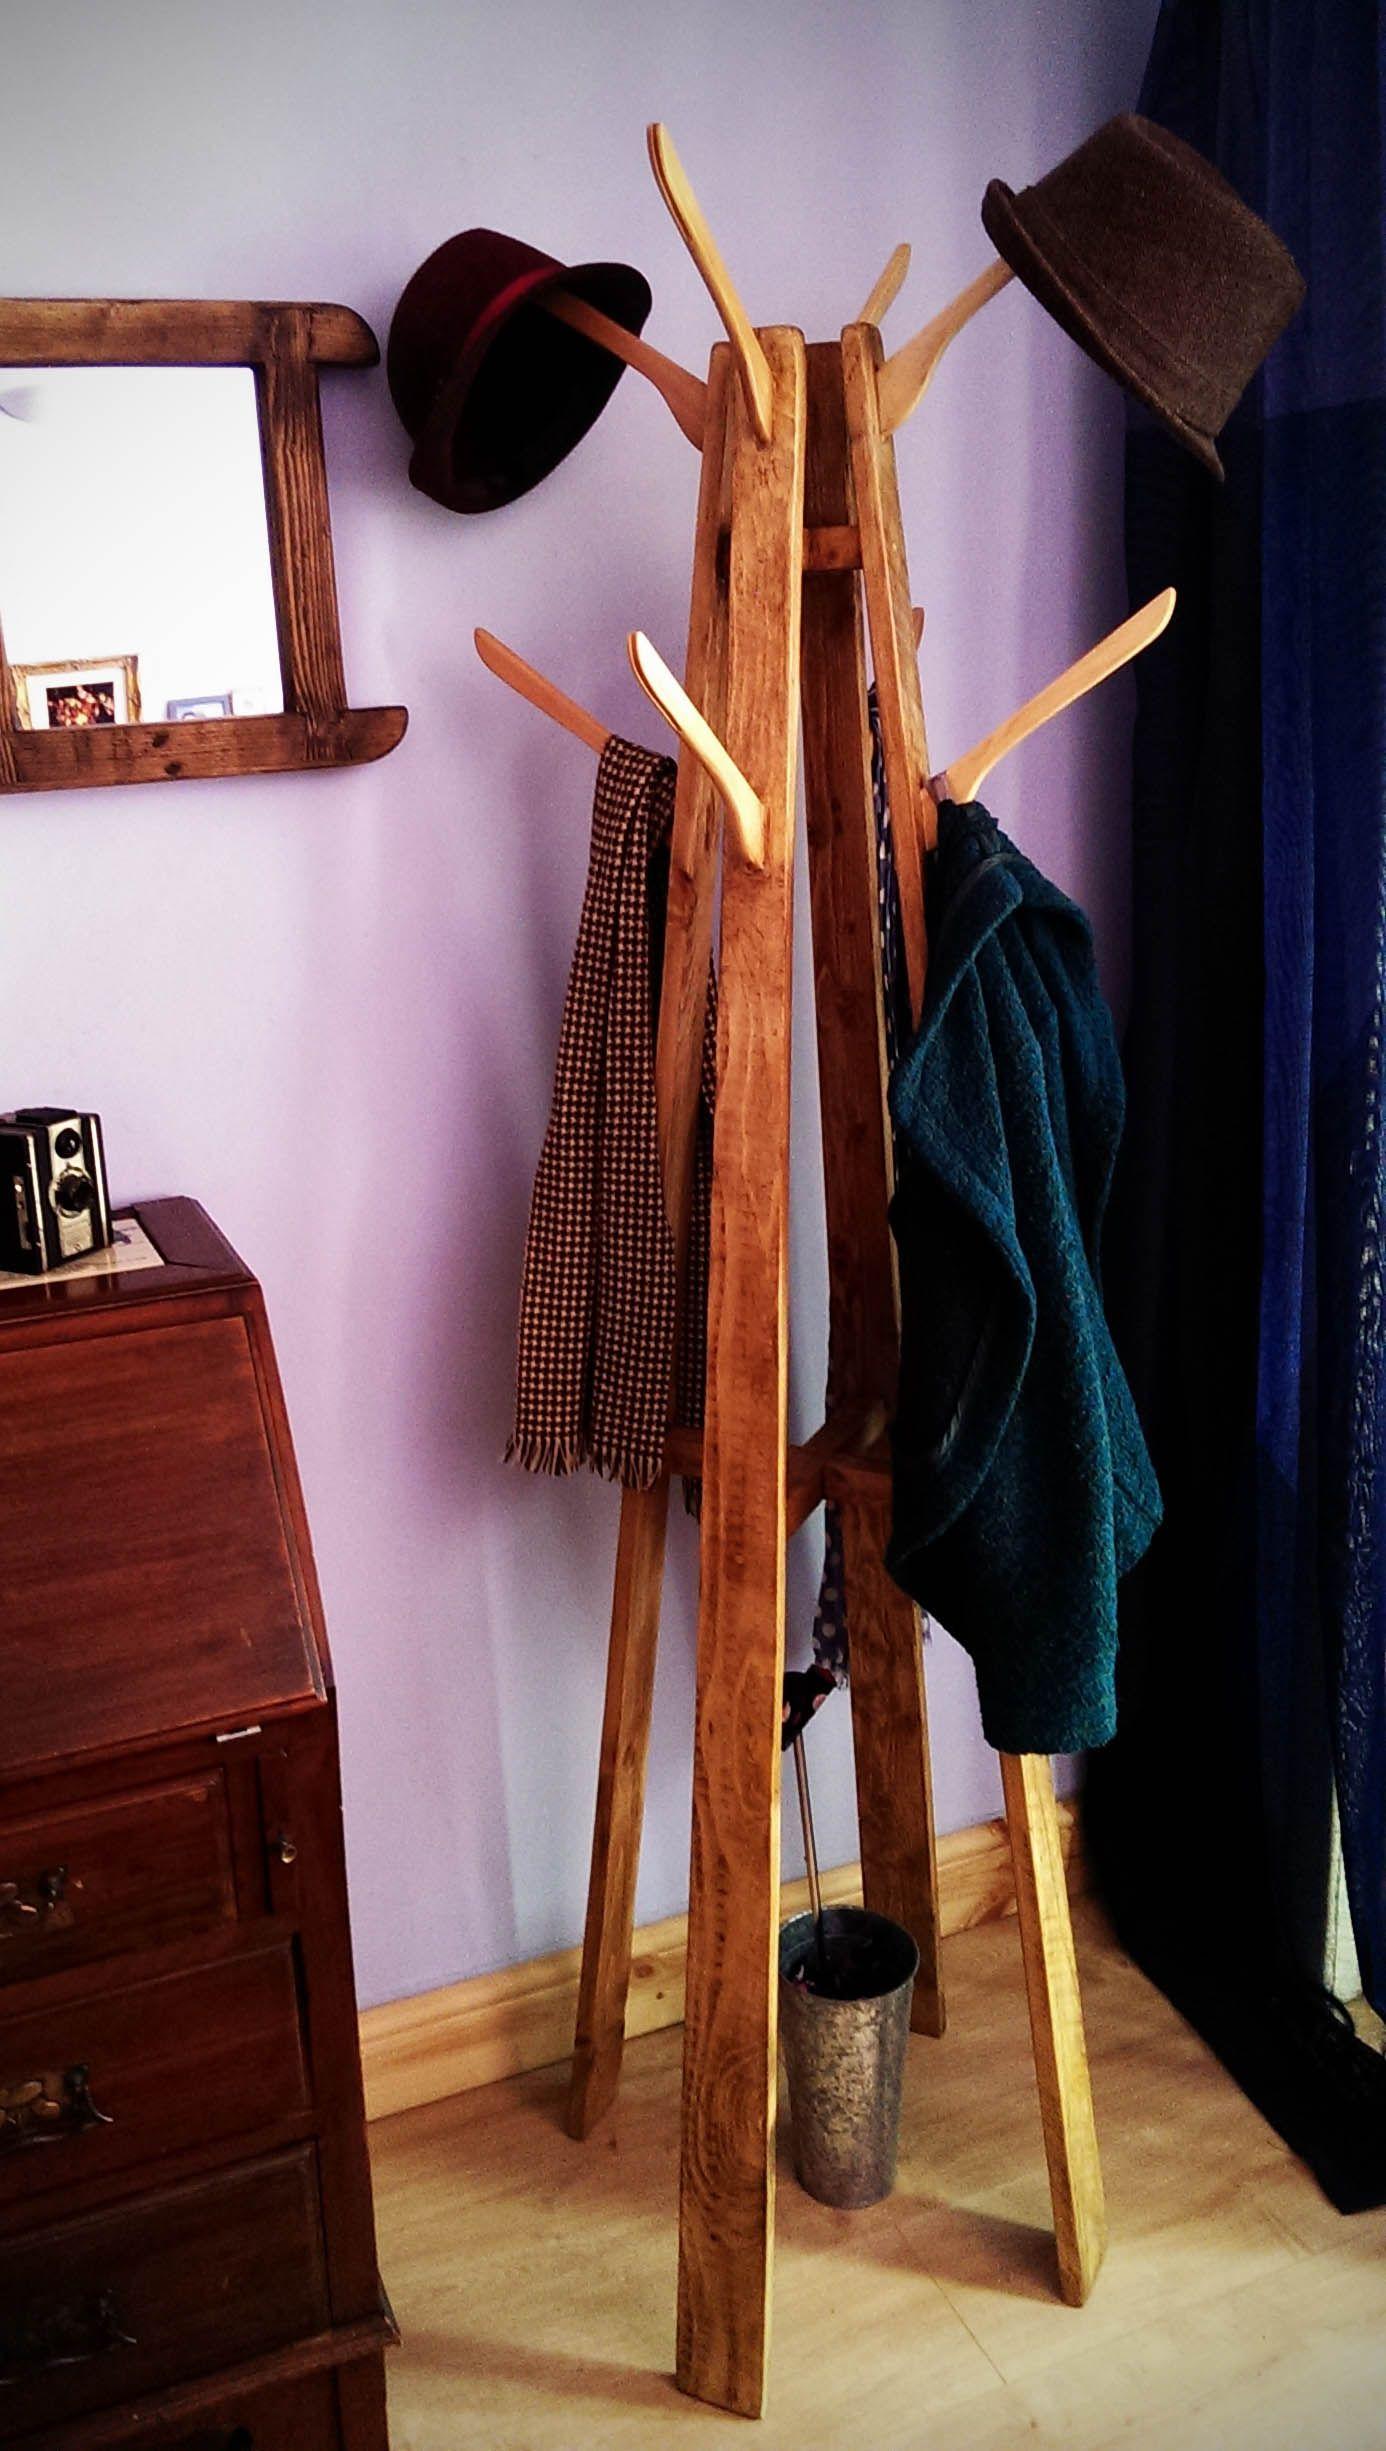 Coat And Hat Stand Reclaimed Wood With Repurposed Coat Hanger Hooks Furniture Repurposed Tree Hat And Coat Stand Coat Hanger Stand Diy Hat Rack